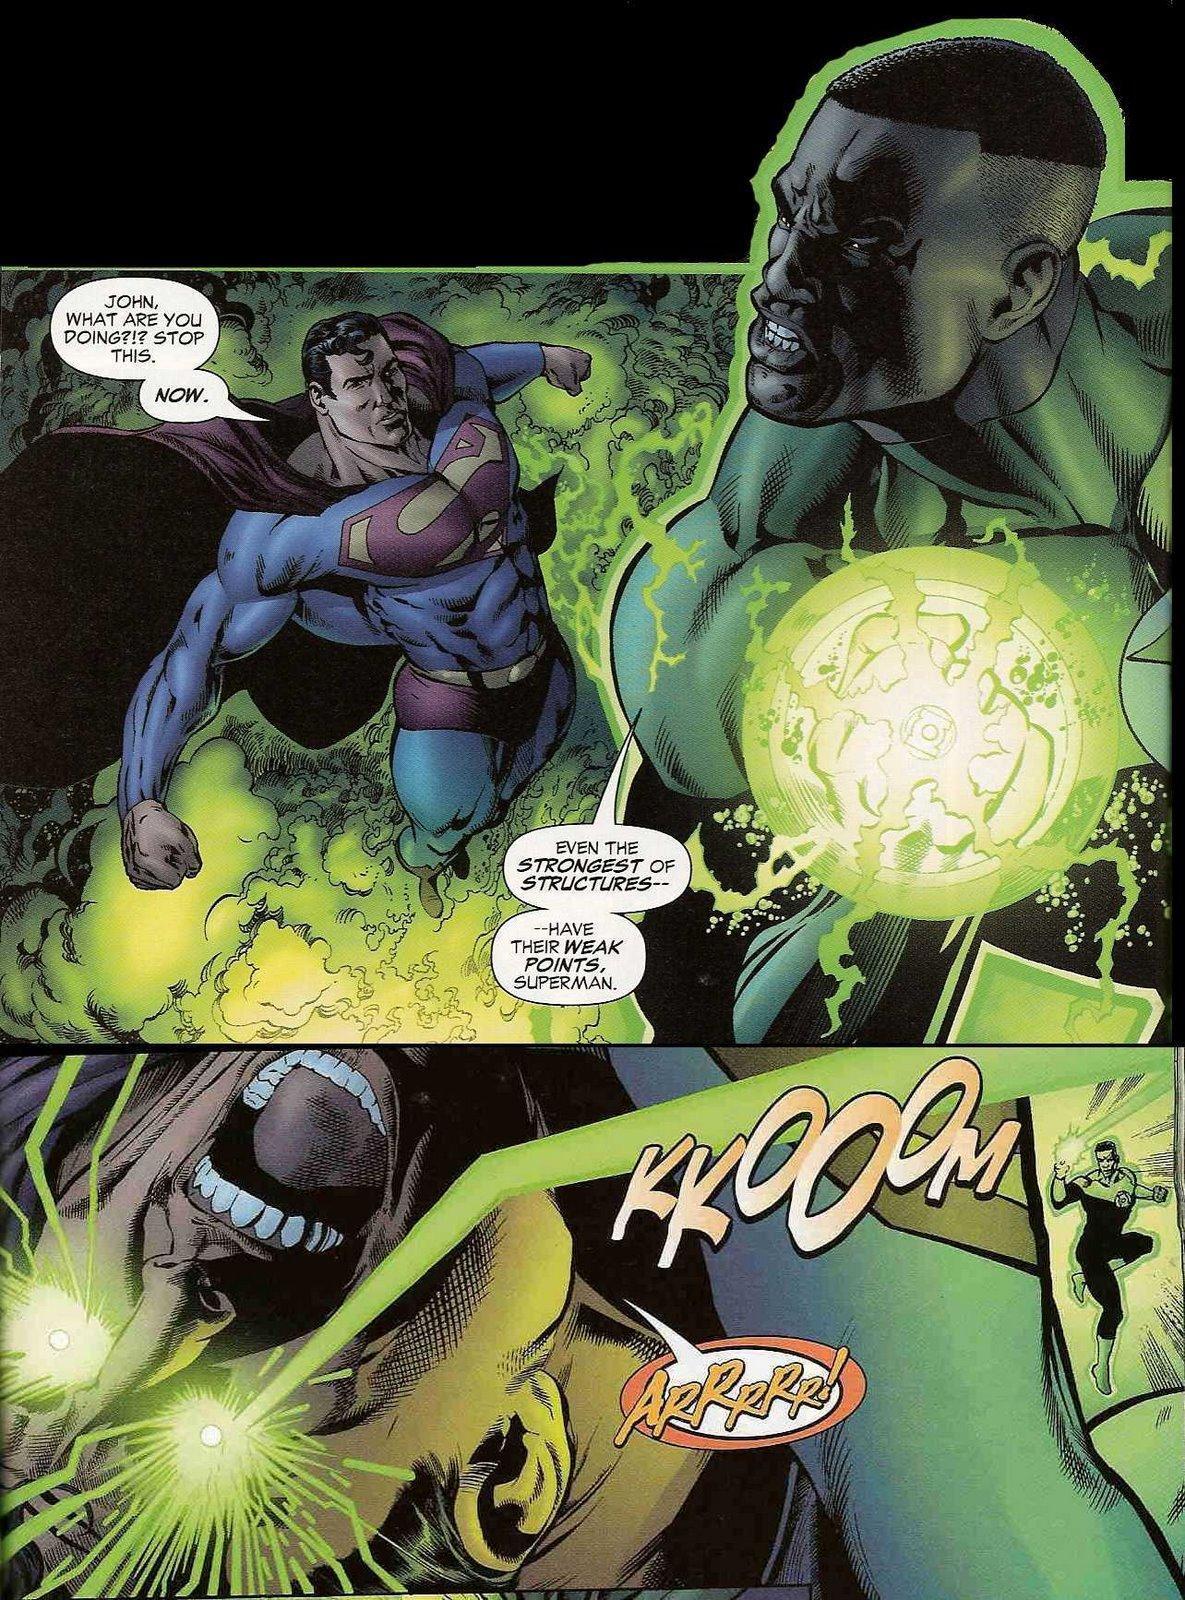 Superman vs green lantern - photo#6